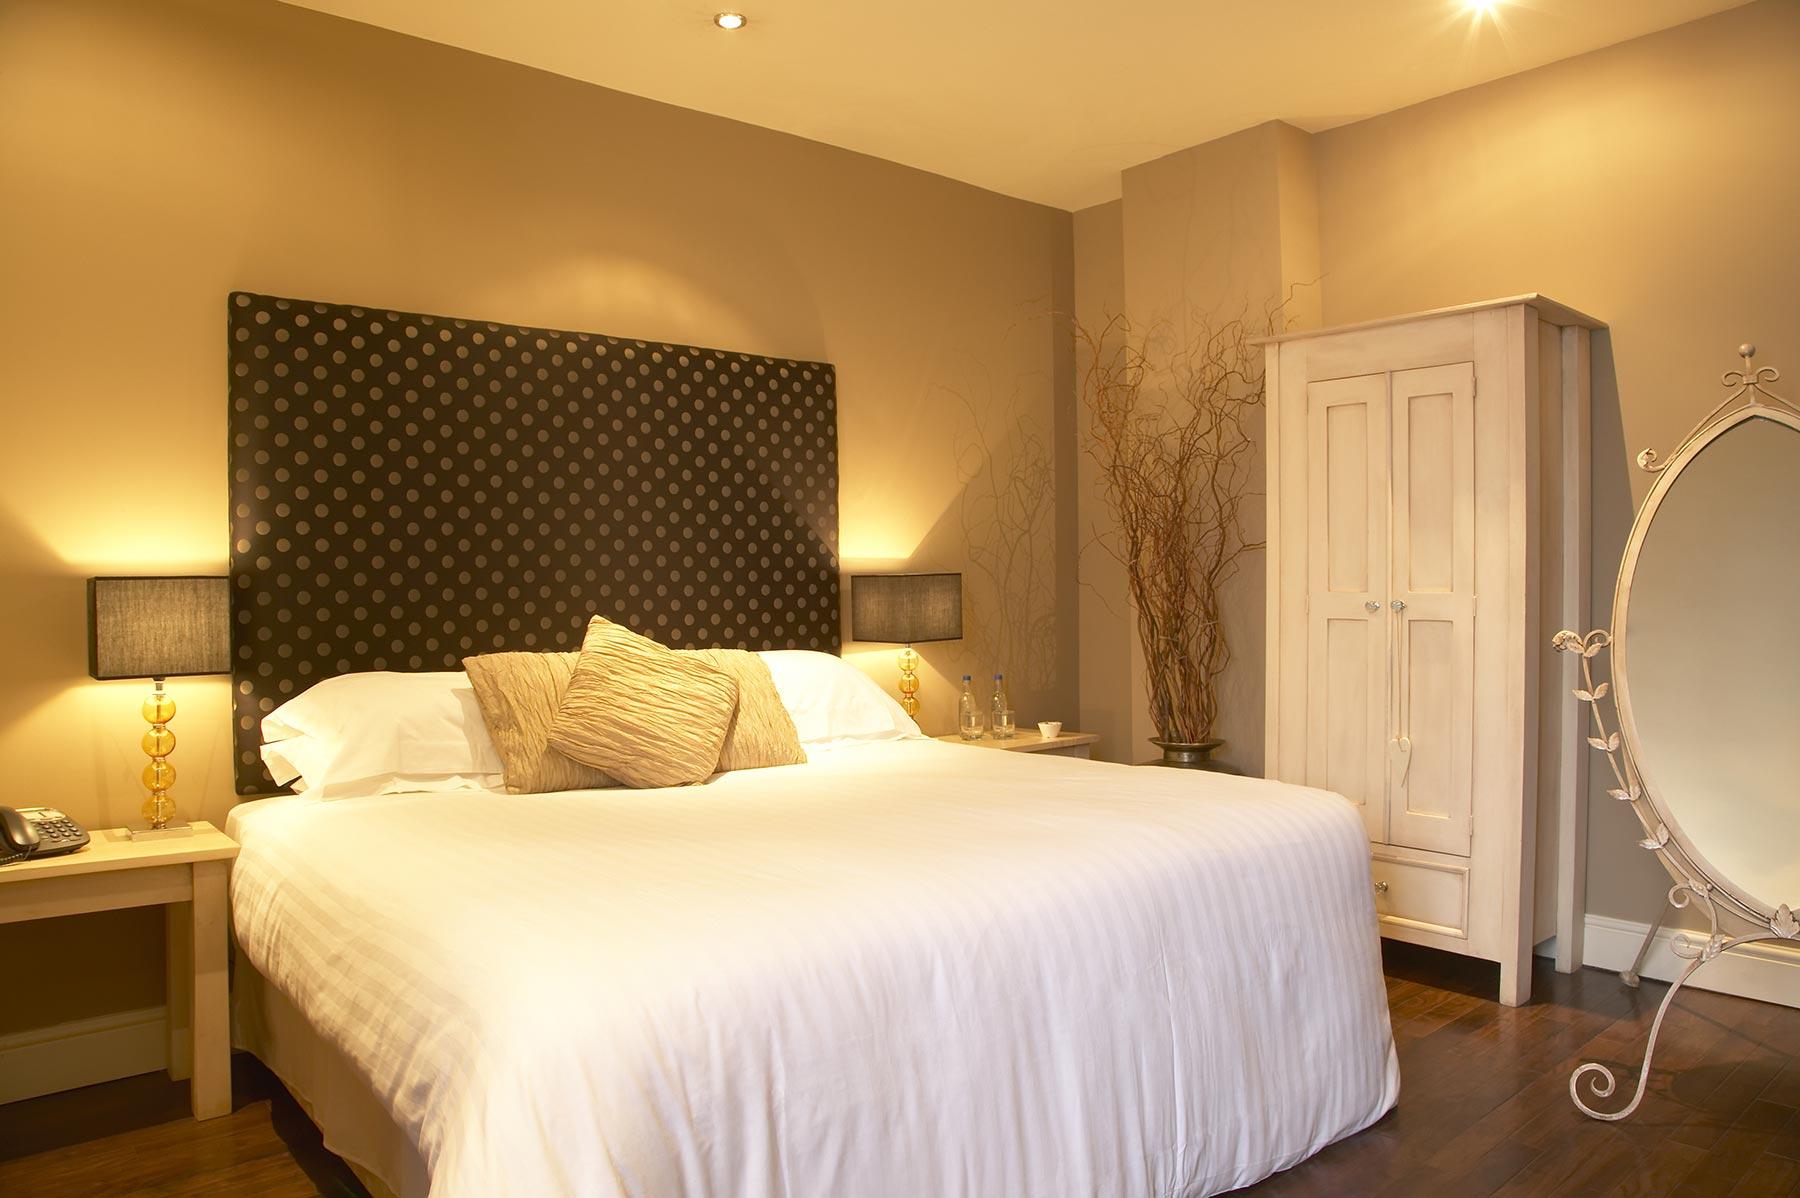 Hotels Attleborough - Mulberry Tree Rooms Attleborough Norfolk